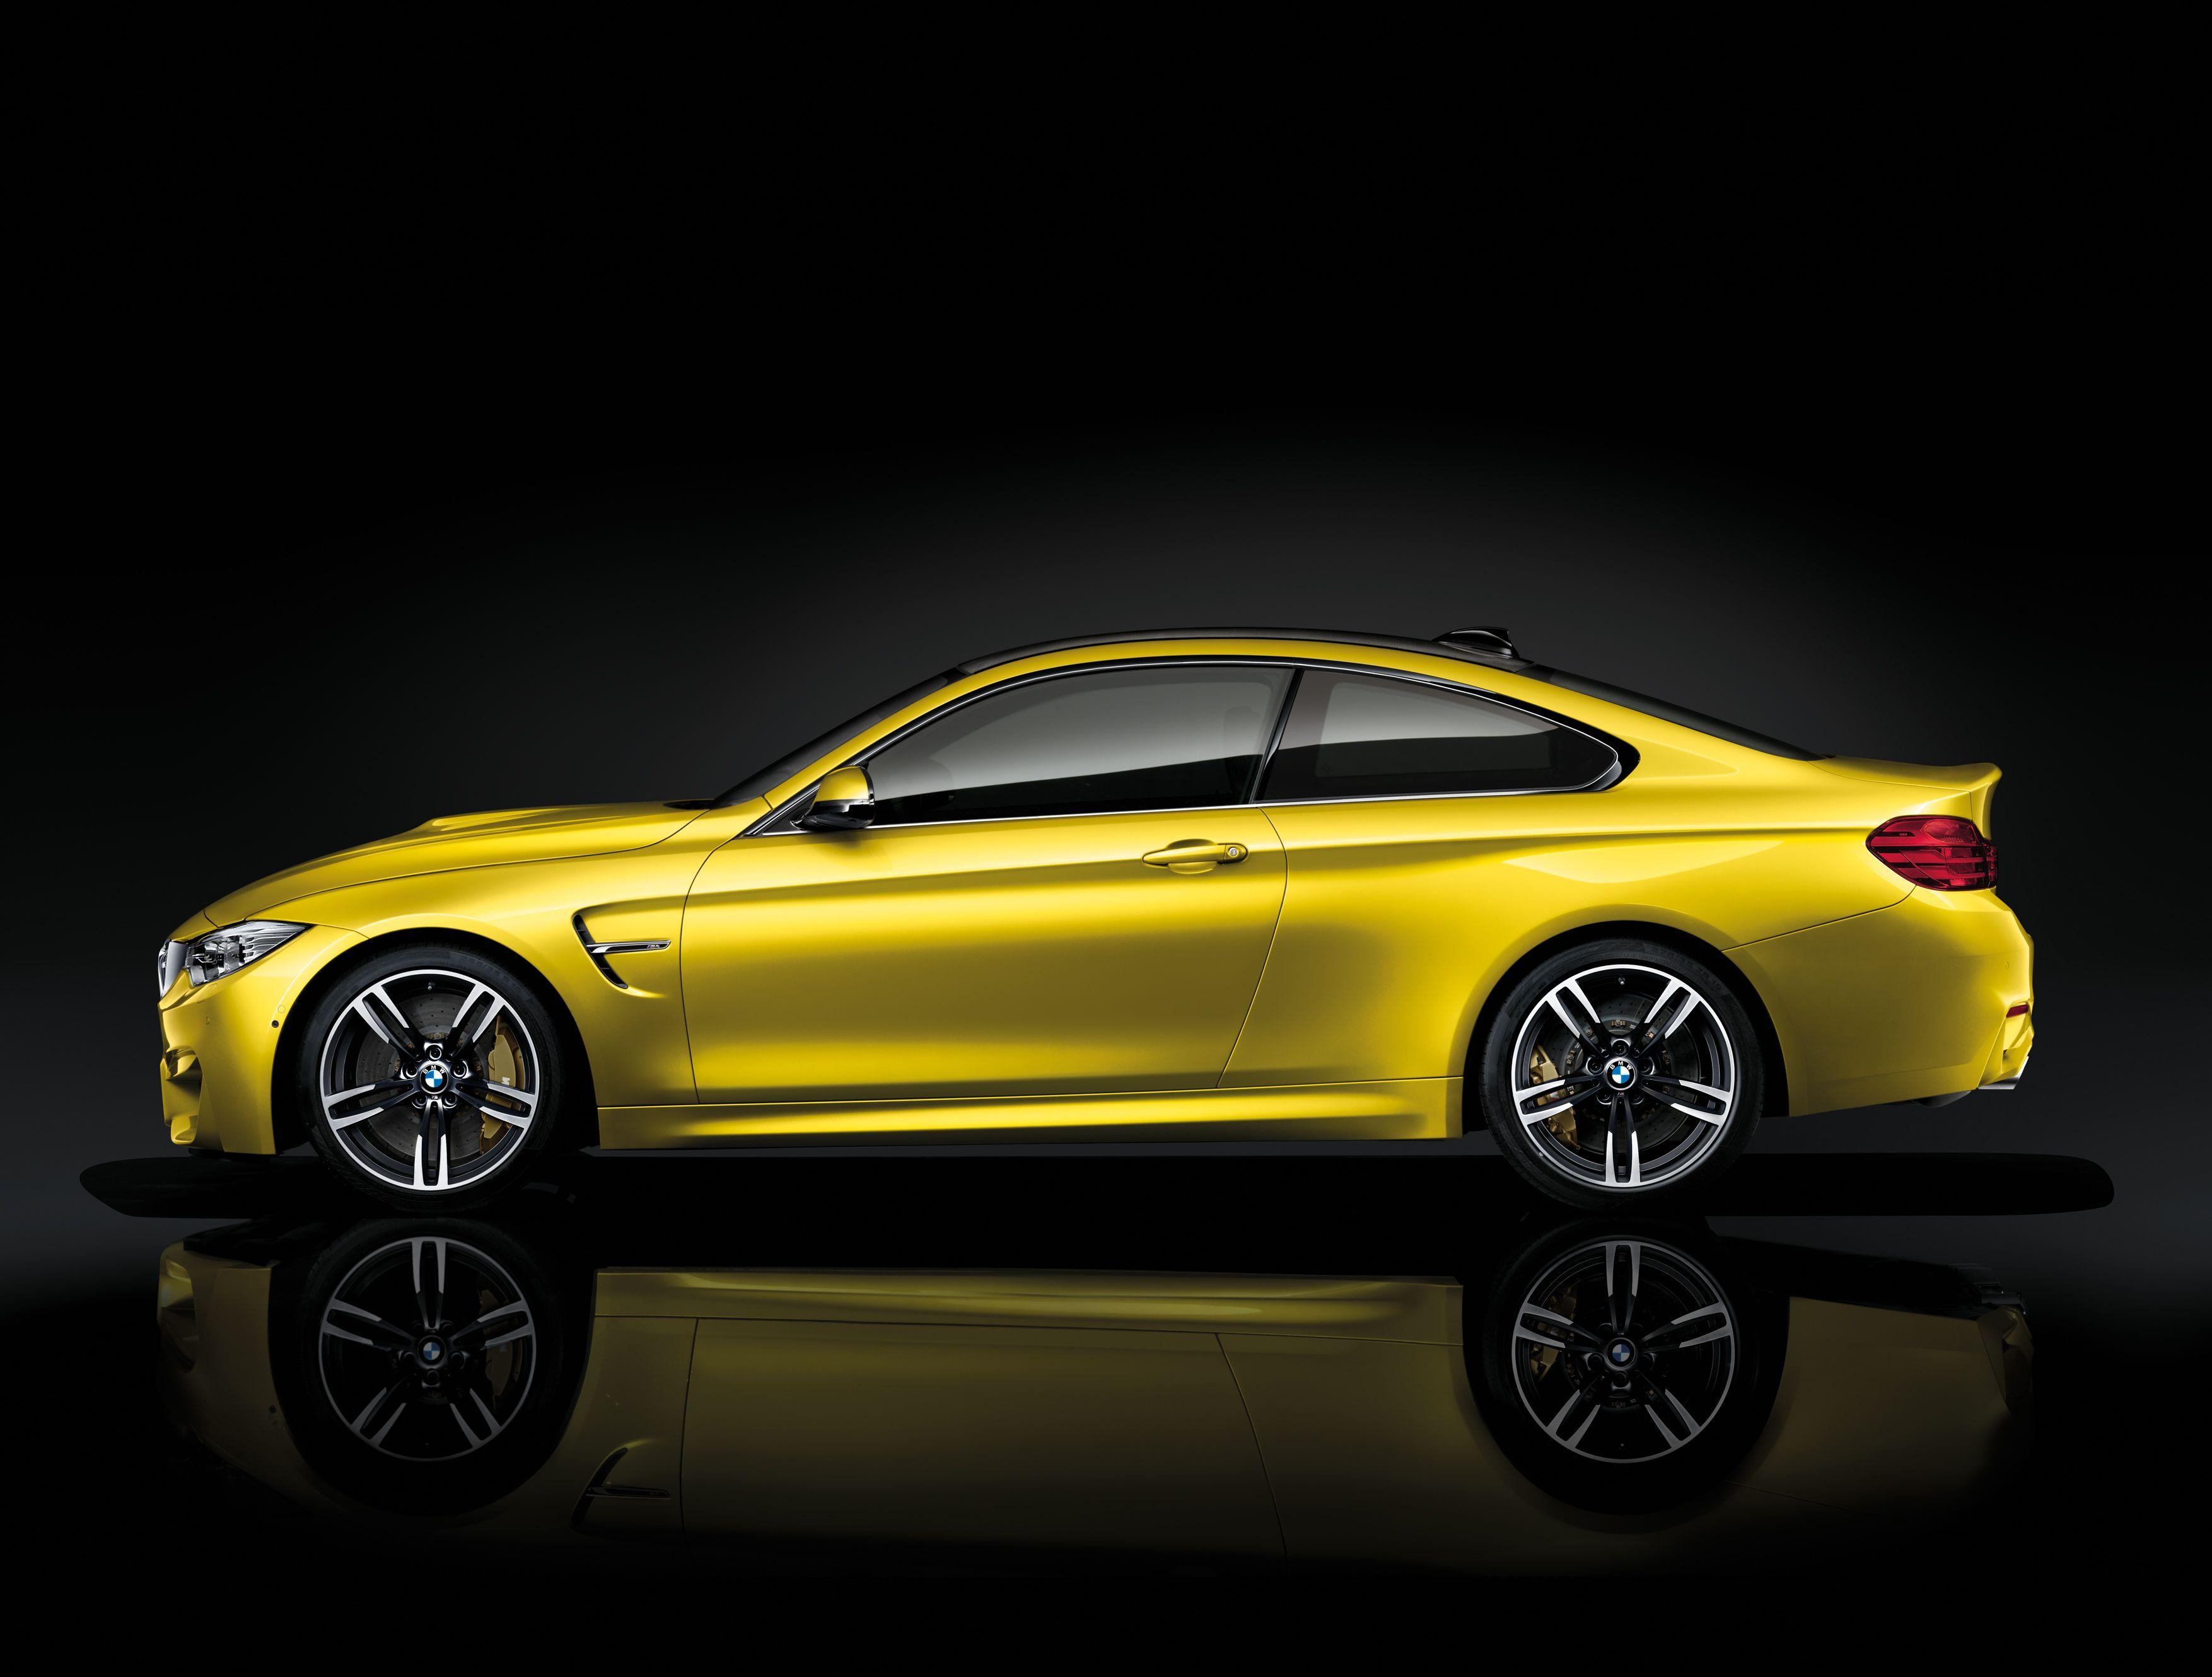 2015 BMW M4. 425hp 3.0 Liter, Inline 6 Cylinder With M TwinPower Turbo